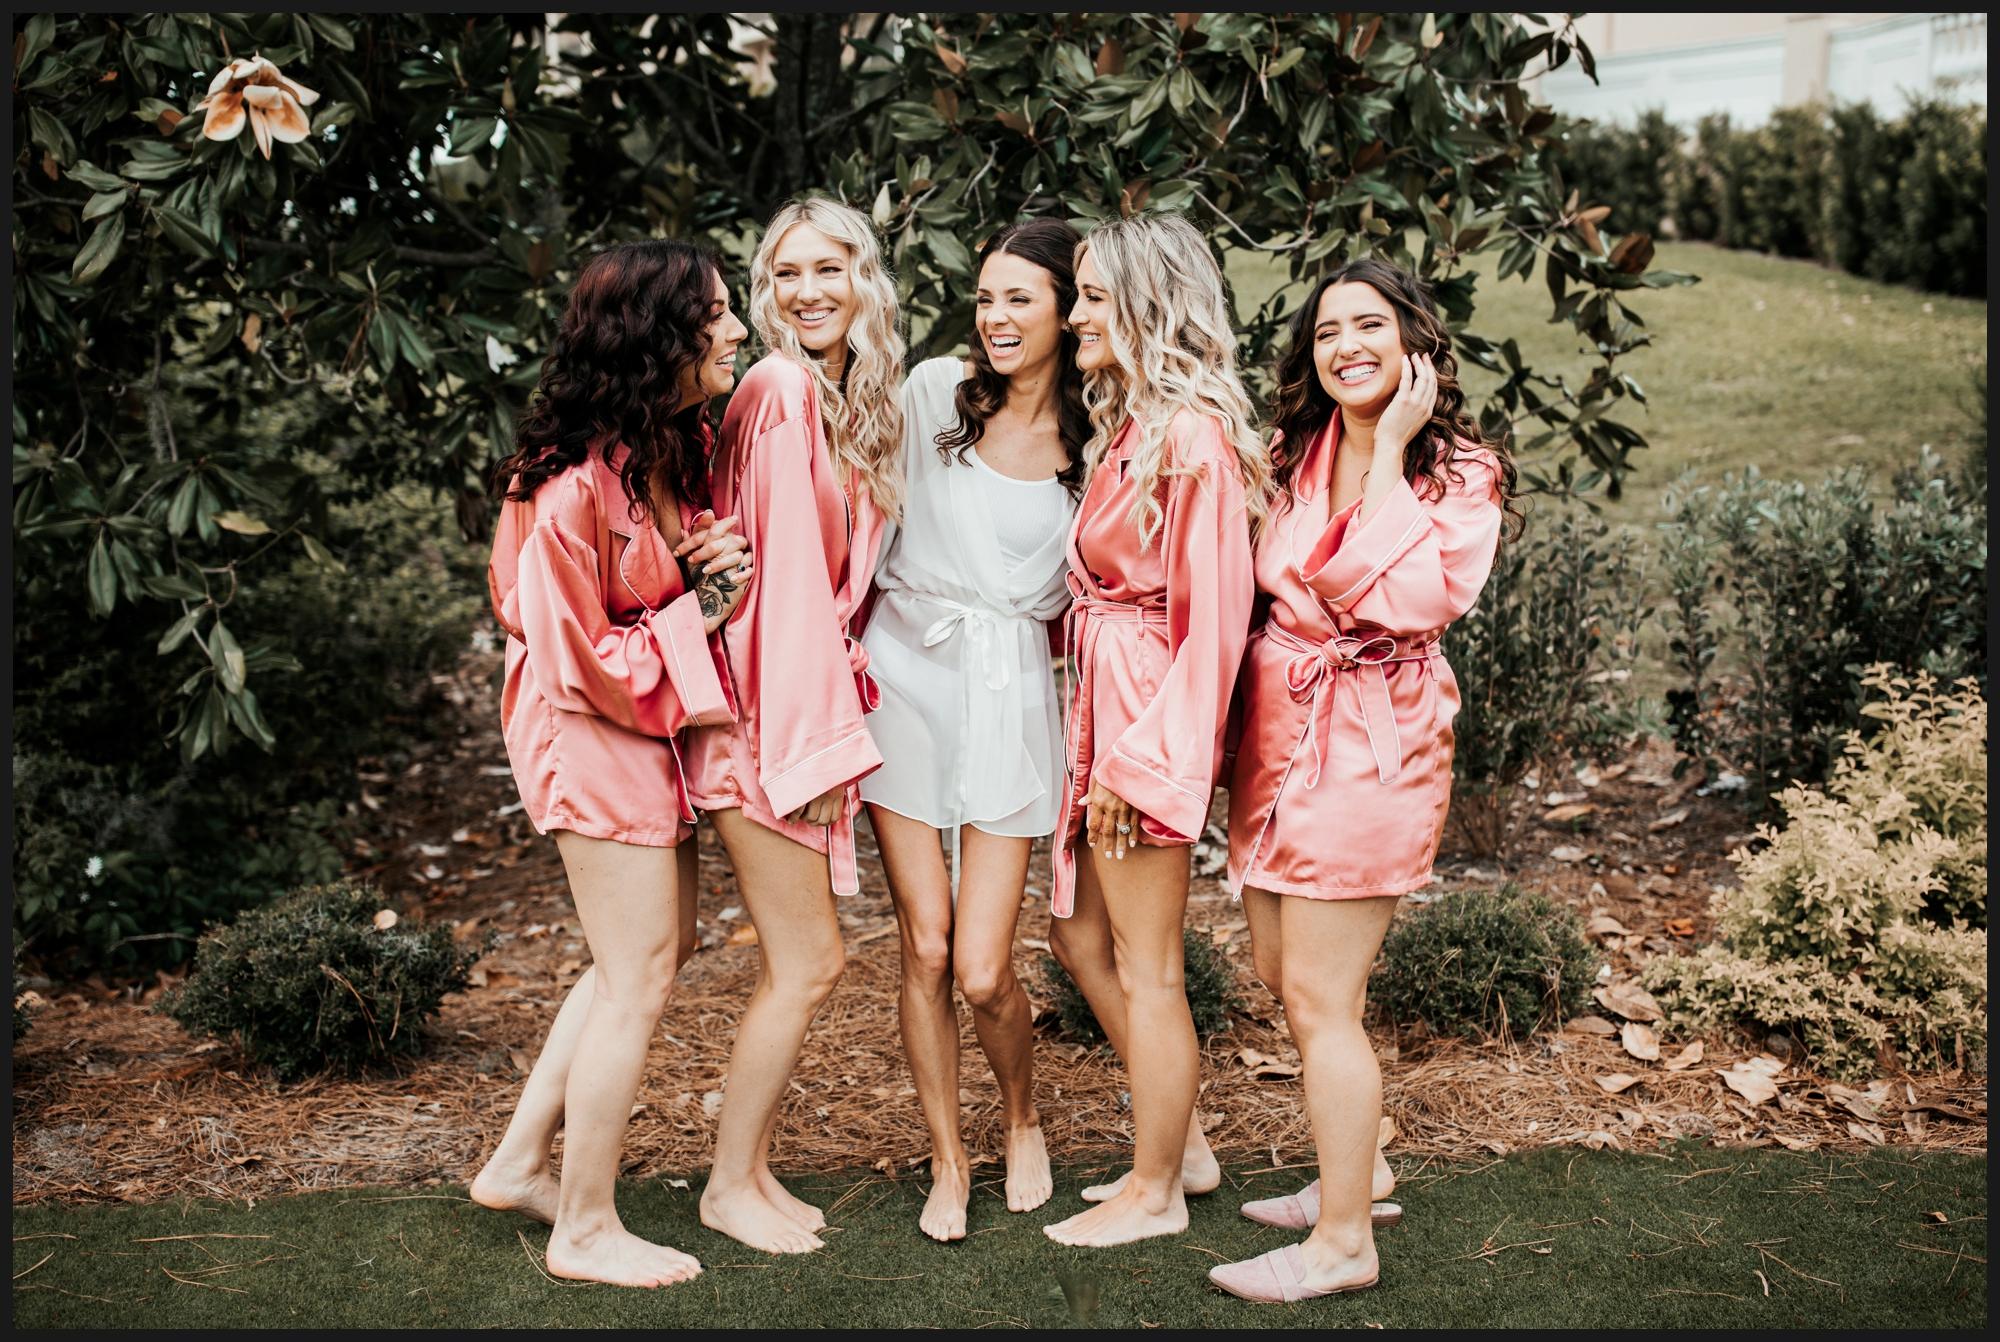 Orlando-Wedding-Photographer-destination-wedding-photographer-florida-wedding-photographer-hawaii-wedding-photographer_0193.jpg